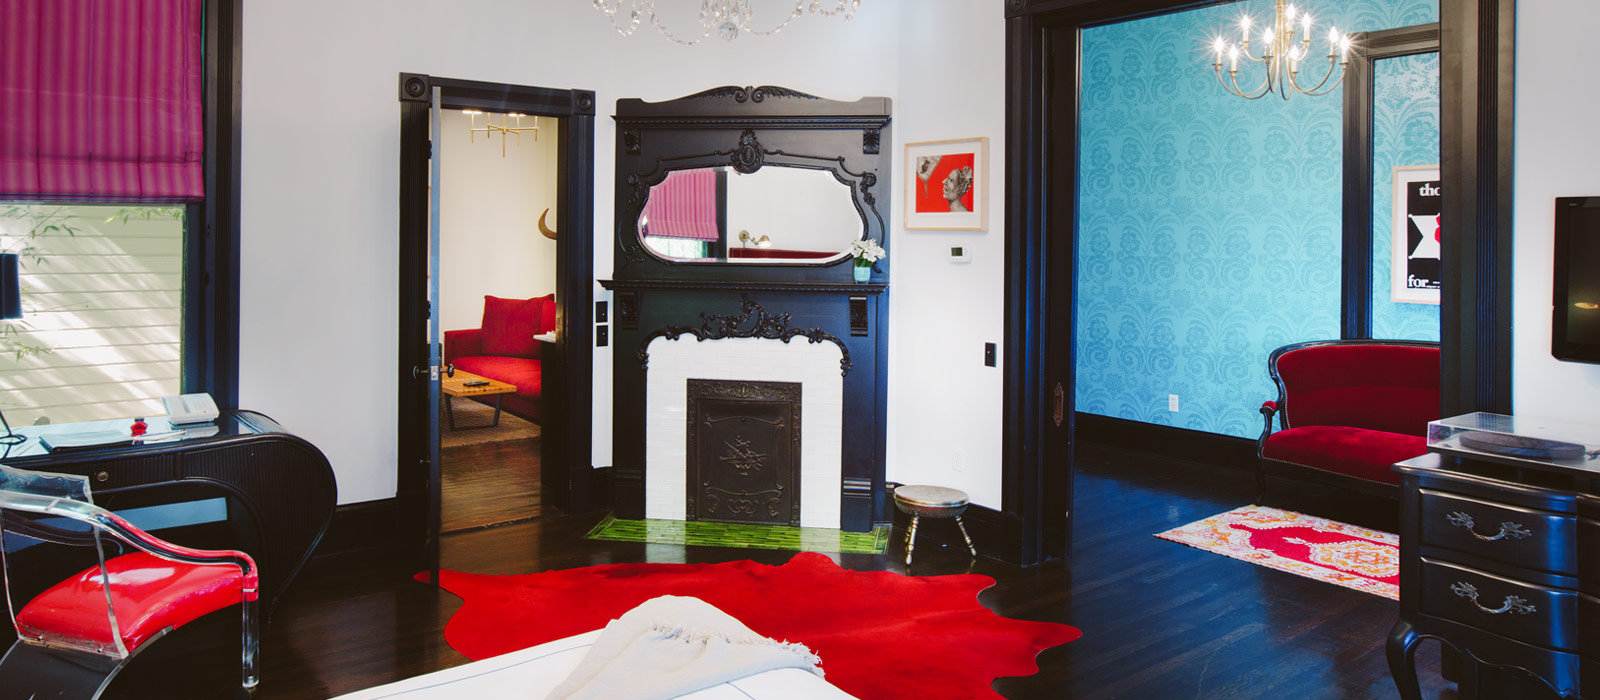 9 suite 1 Hotel Saint Cecilia Austin Texas interior design vintage apartment ciekawe wnetrza hotelowe styl amerykanski